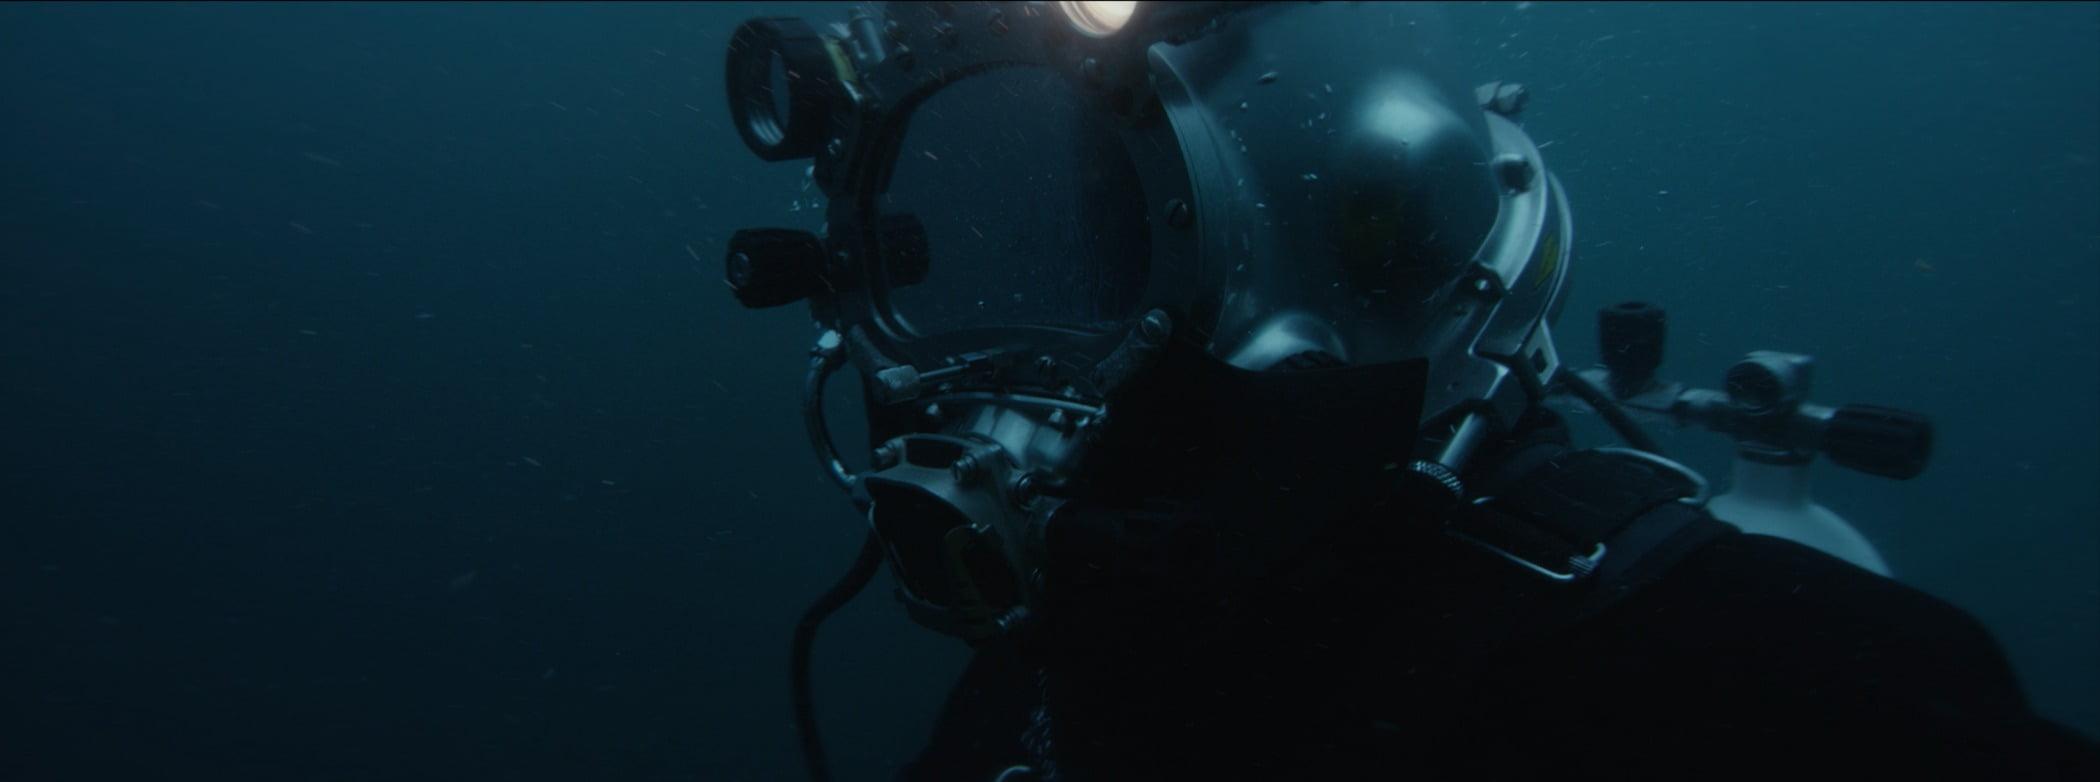 Underwater diving, Automotive lighting, Water, Divemaster, Fluid, Aquanaut